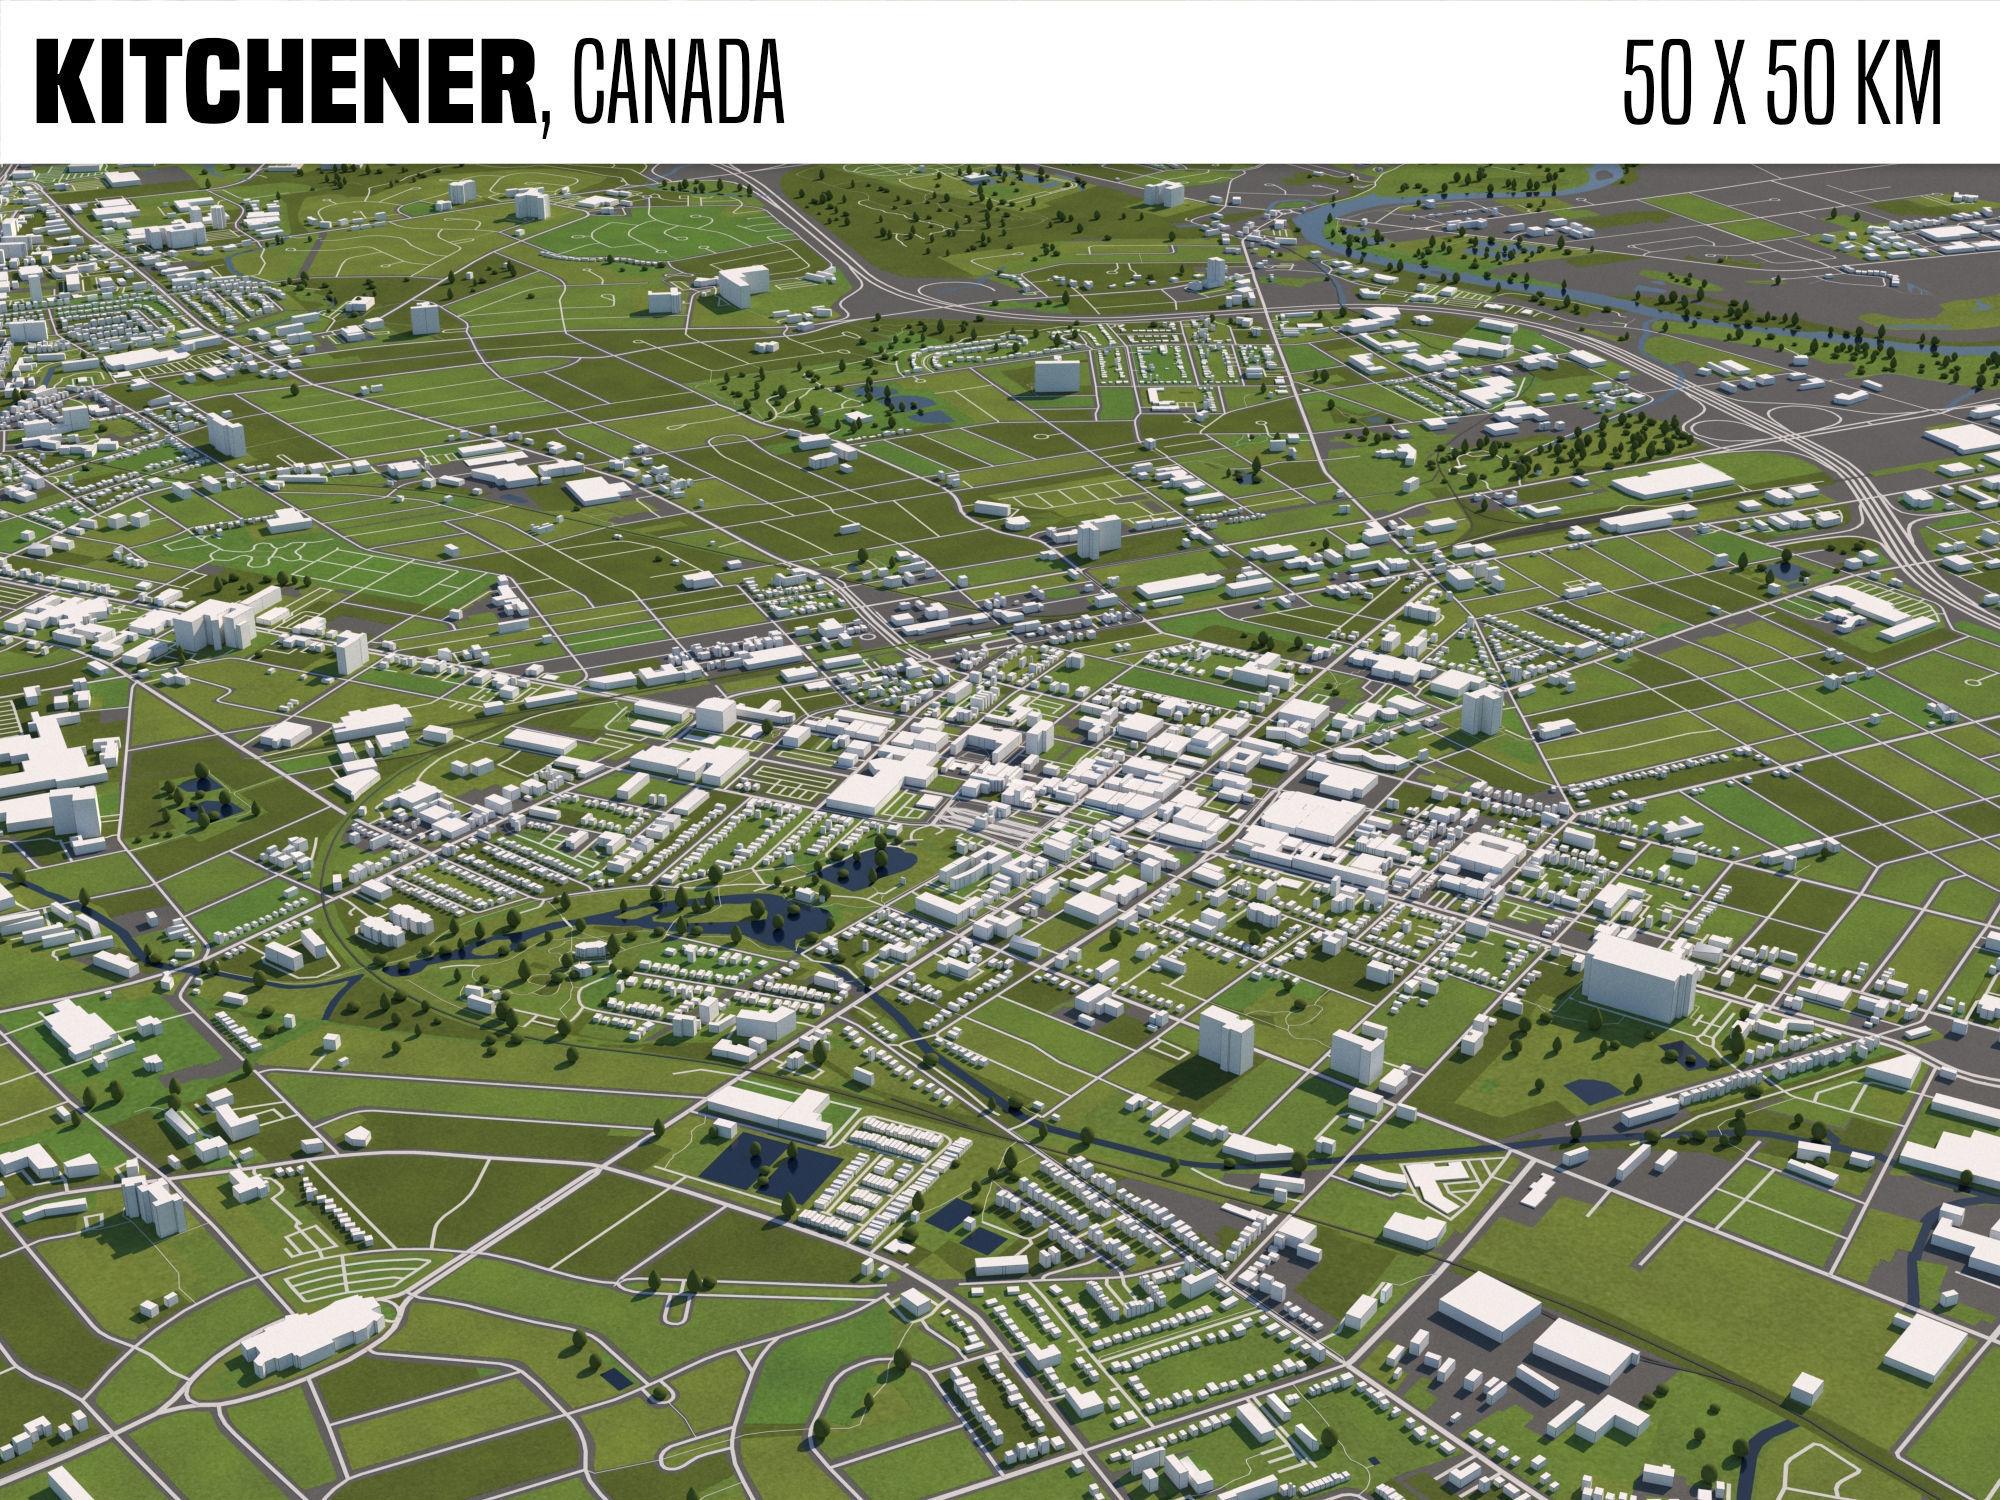 Kitchener Canada